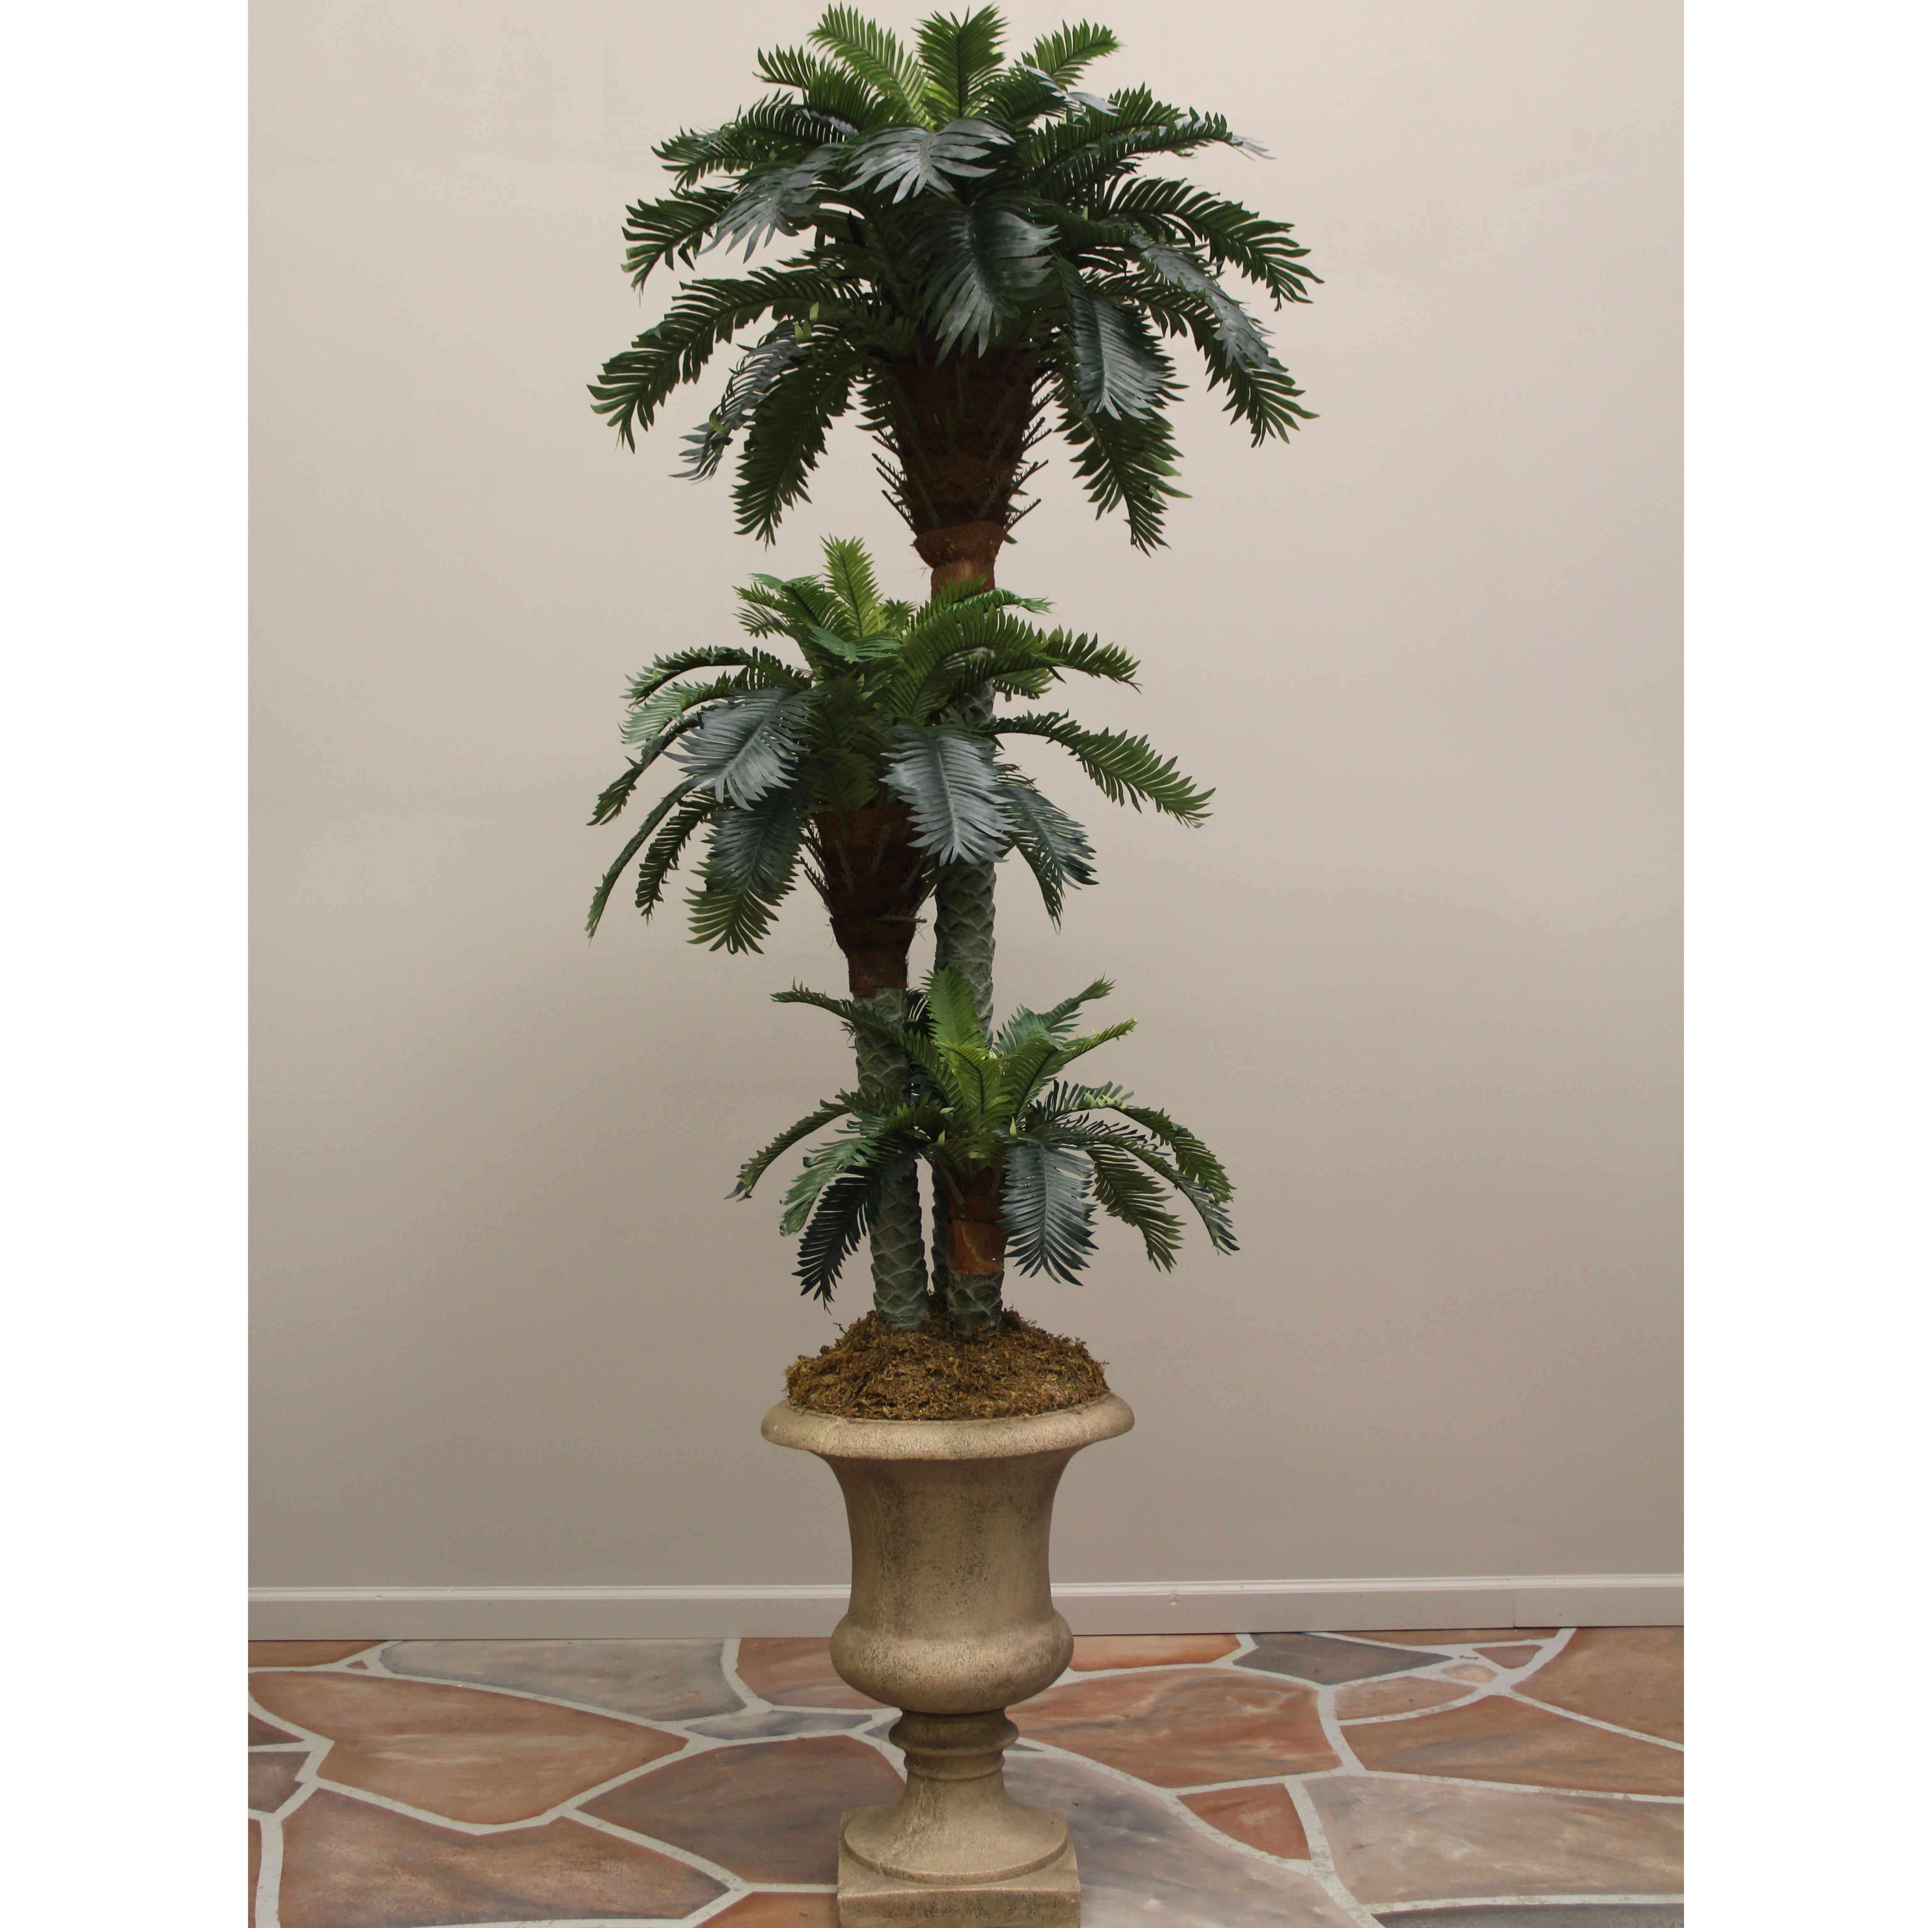 Palm Tree Home Decor 28 Images Palm Tree Home Decor Home Decorators Catalog Best Ideas of Home Decor and Design [homedecoratorscatalog.us]